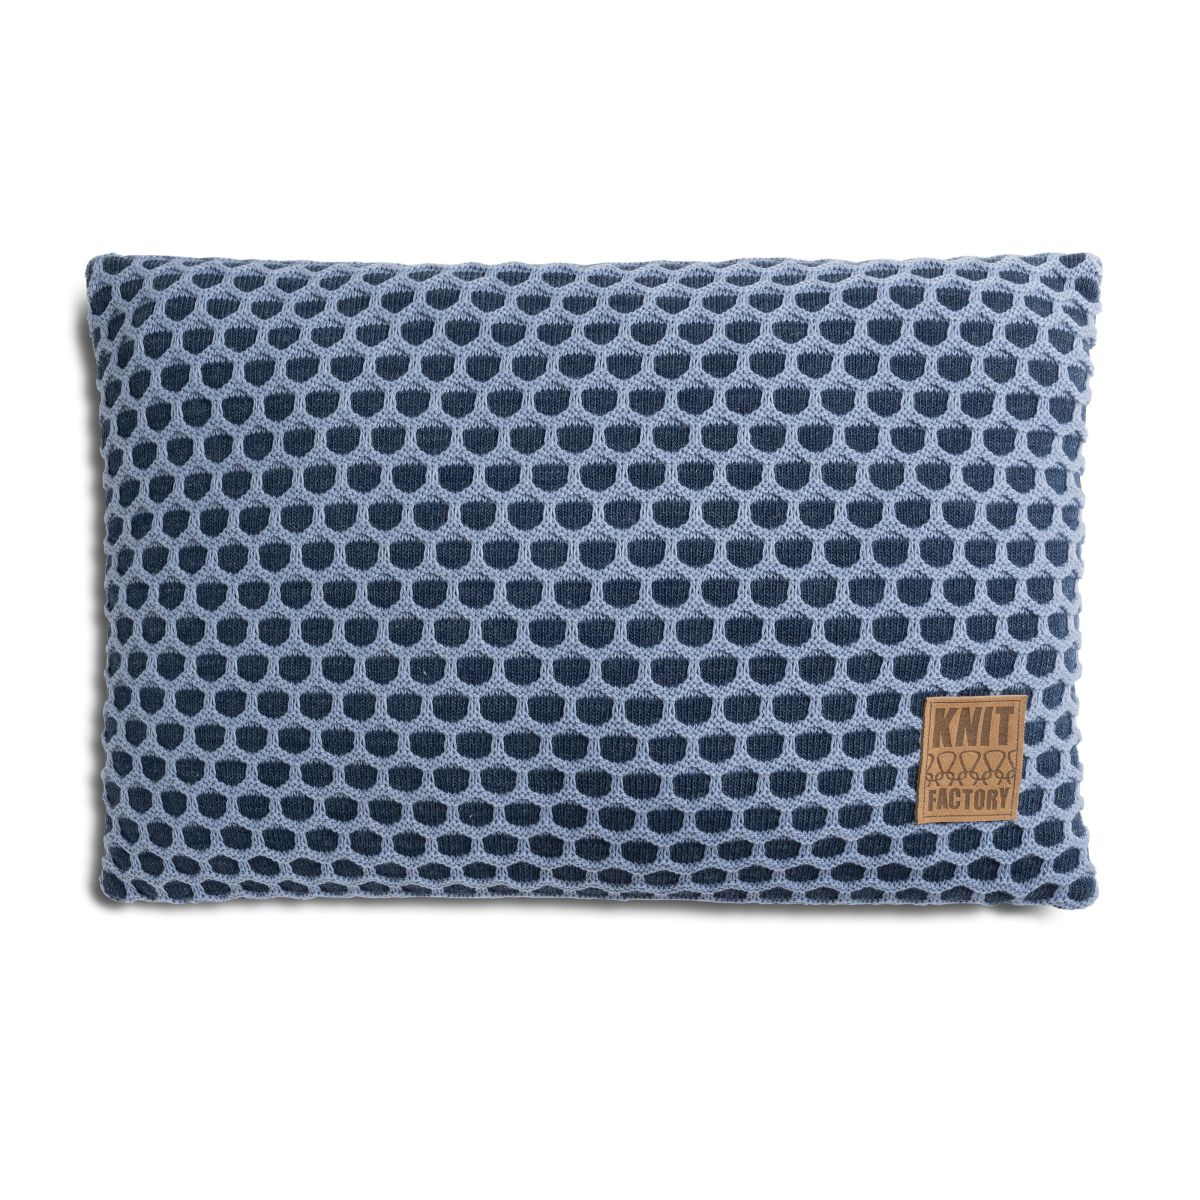 knit factory 1081354 kussen 60x40 mila jeans indigo 1